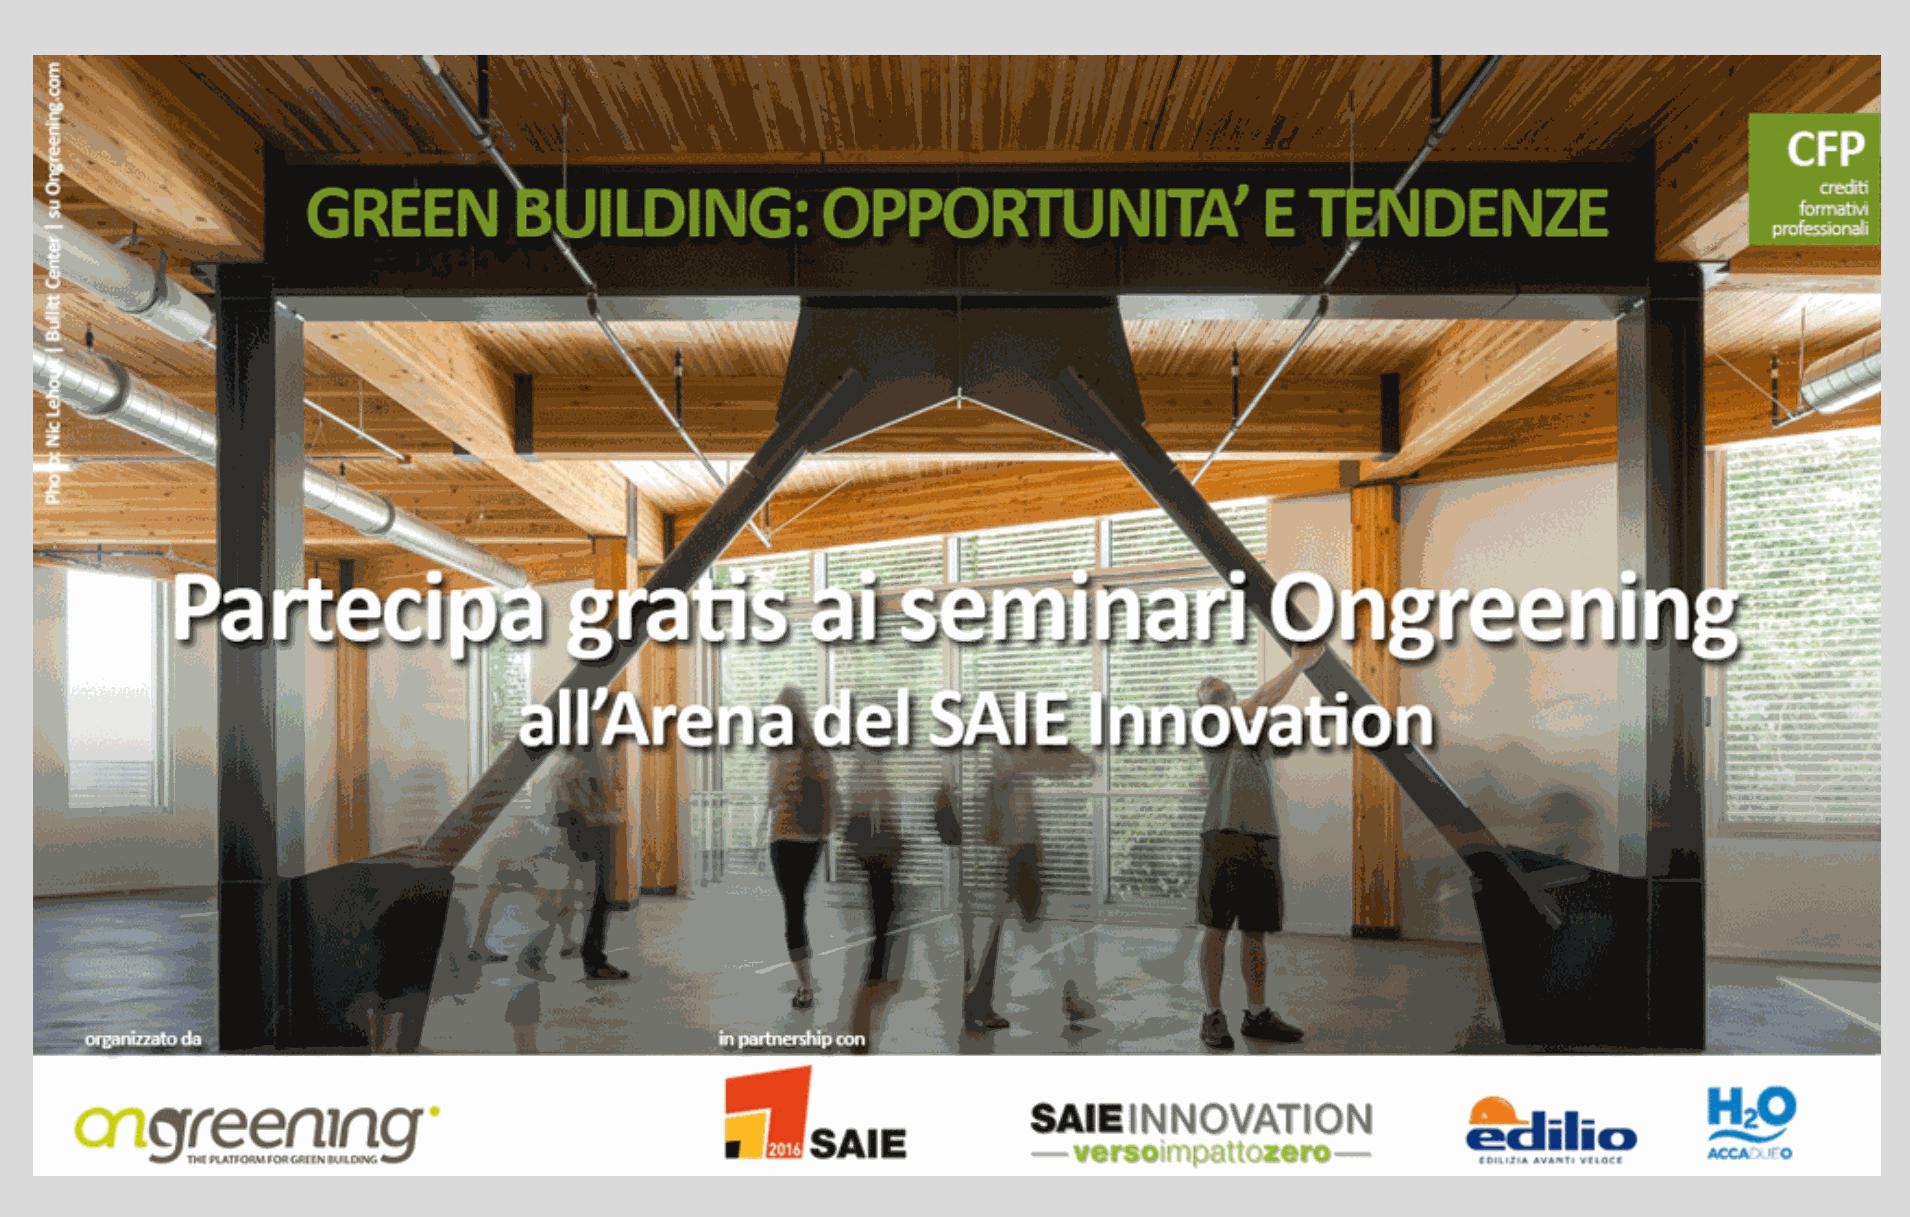 SAIE e Ongreening 2016